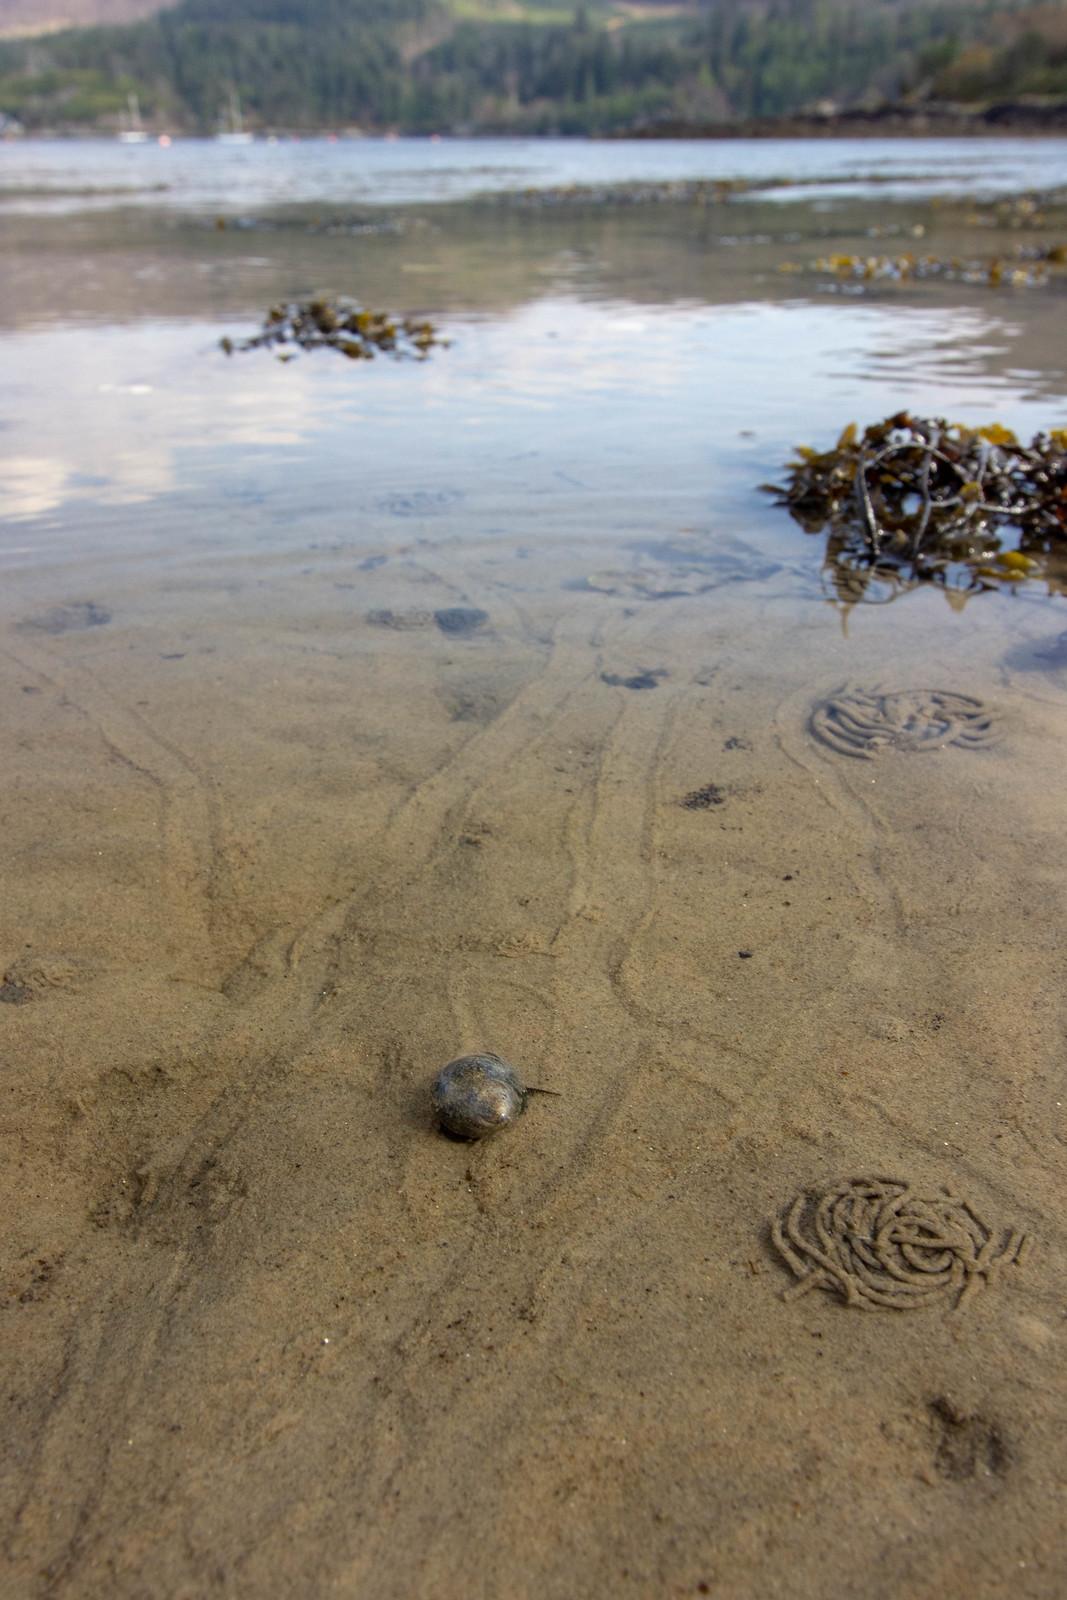 Sea snails seen along the shore in Plockton